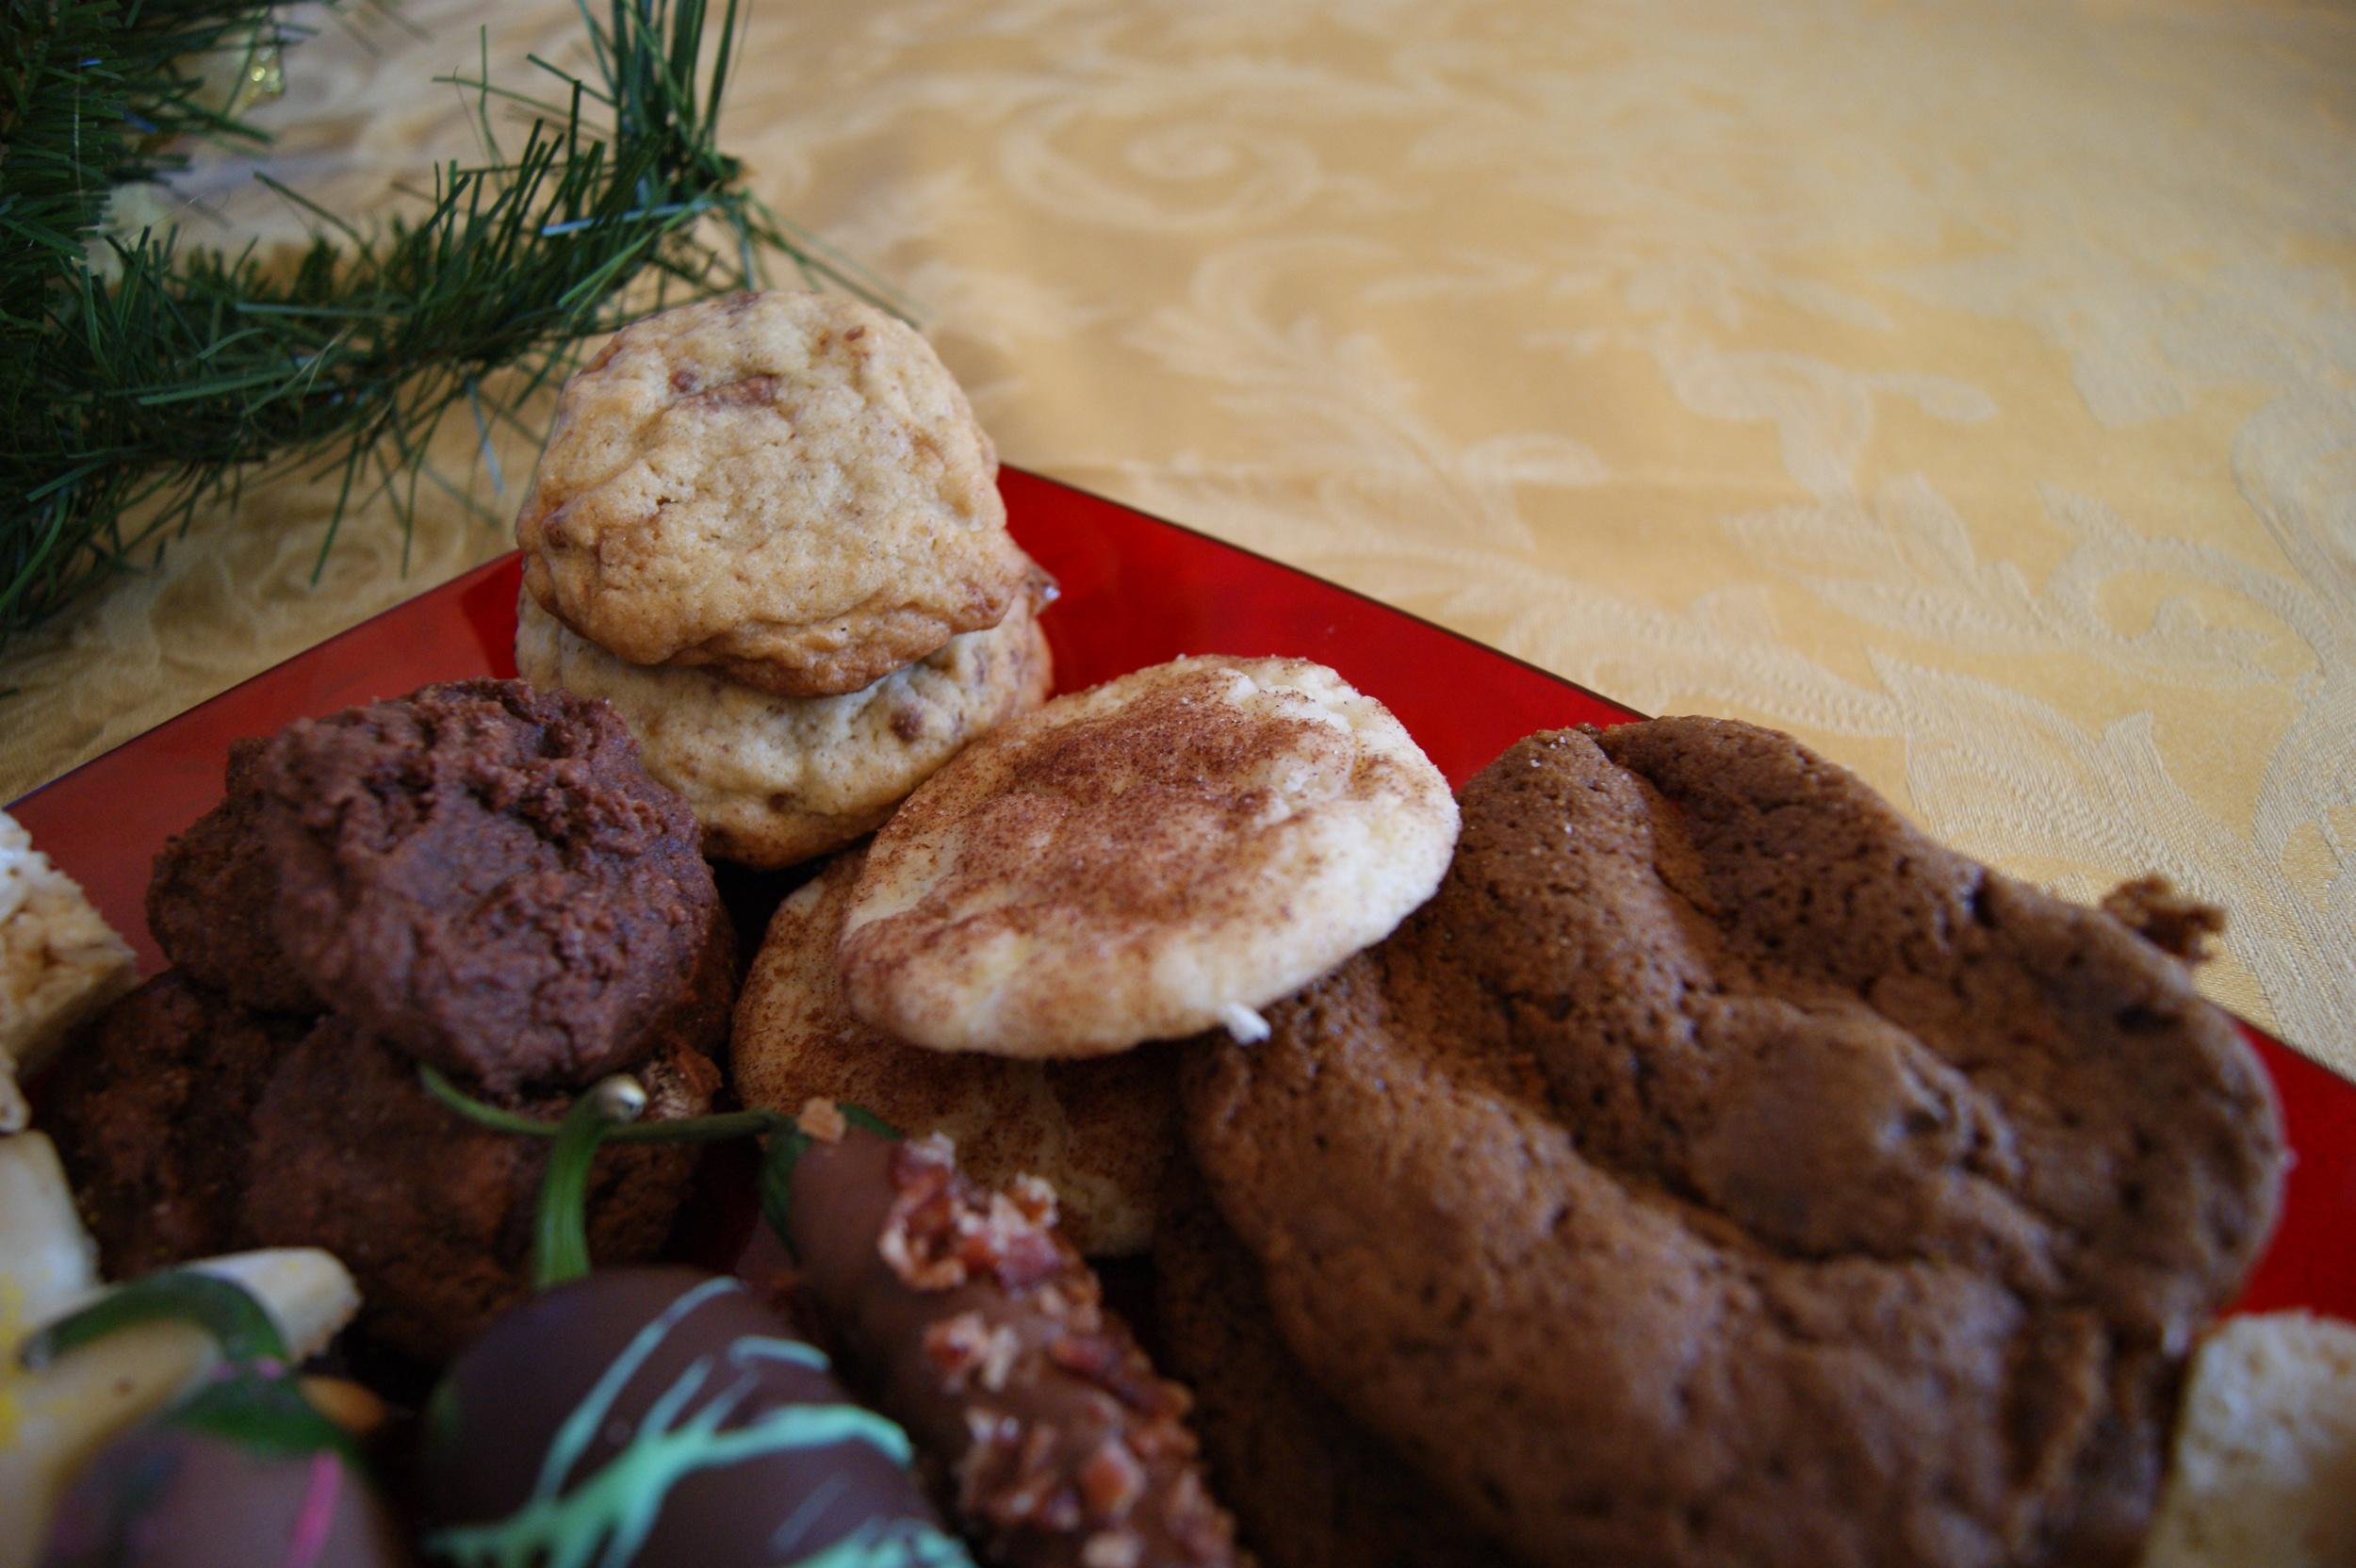 Lauren's chocolate fudge cookies, Michelle's toffee cookies, Kate's snickerdoodles, Sarah's chocolate coffee cookies